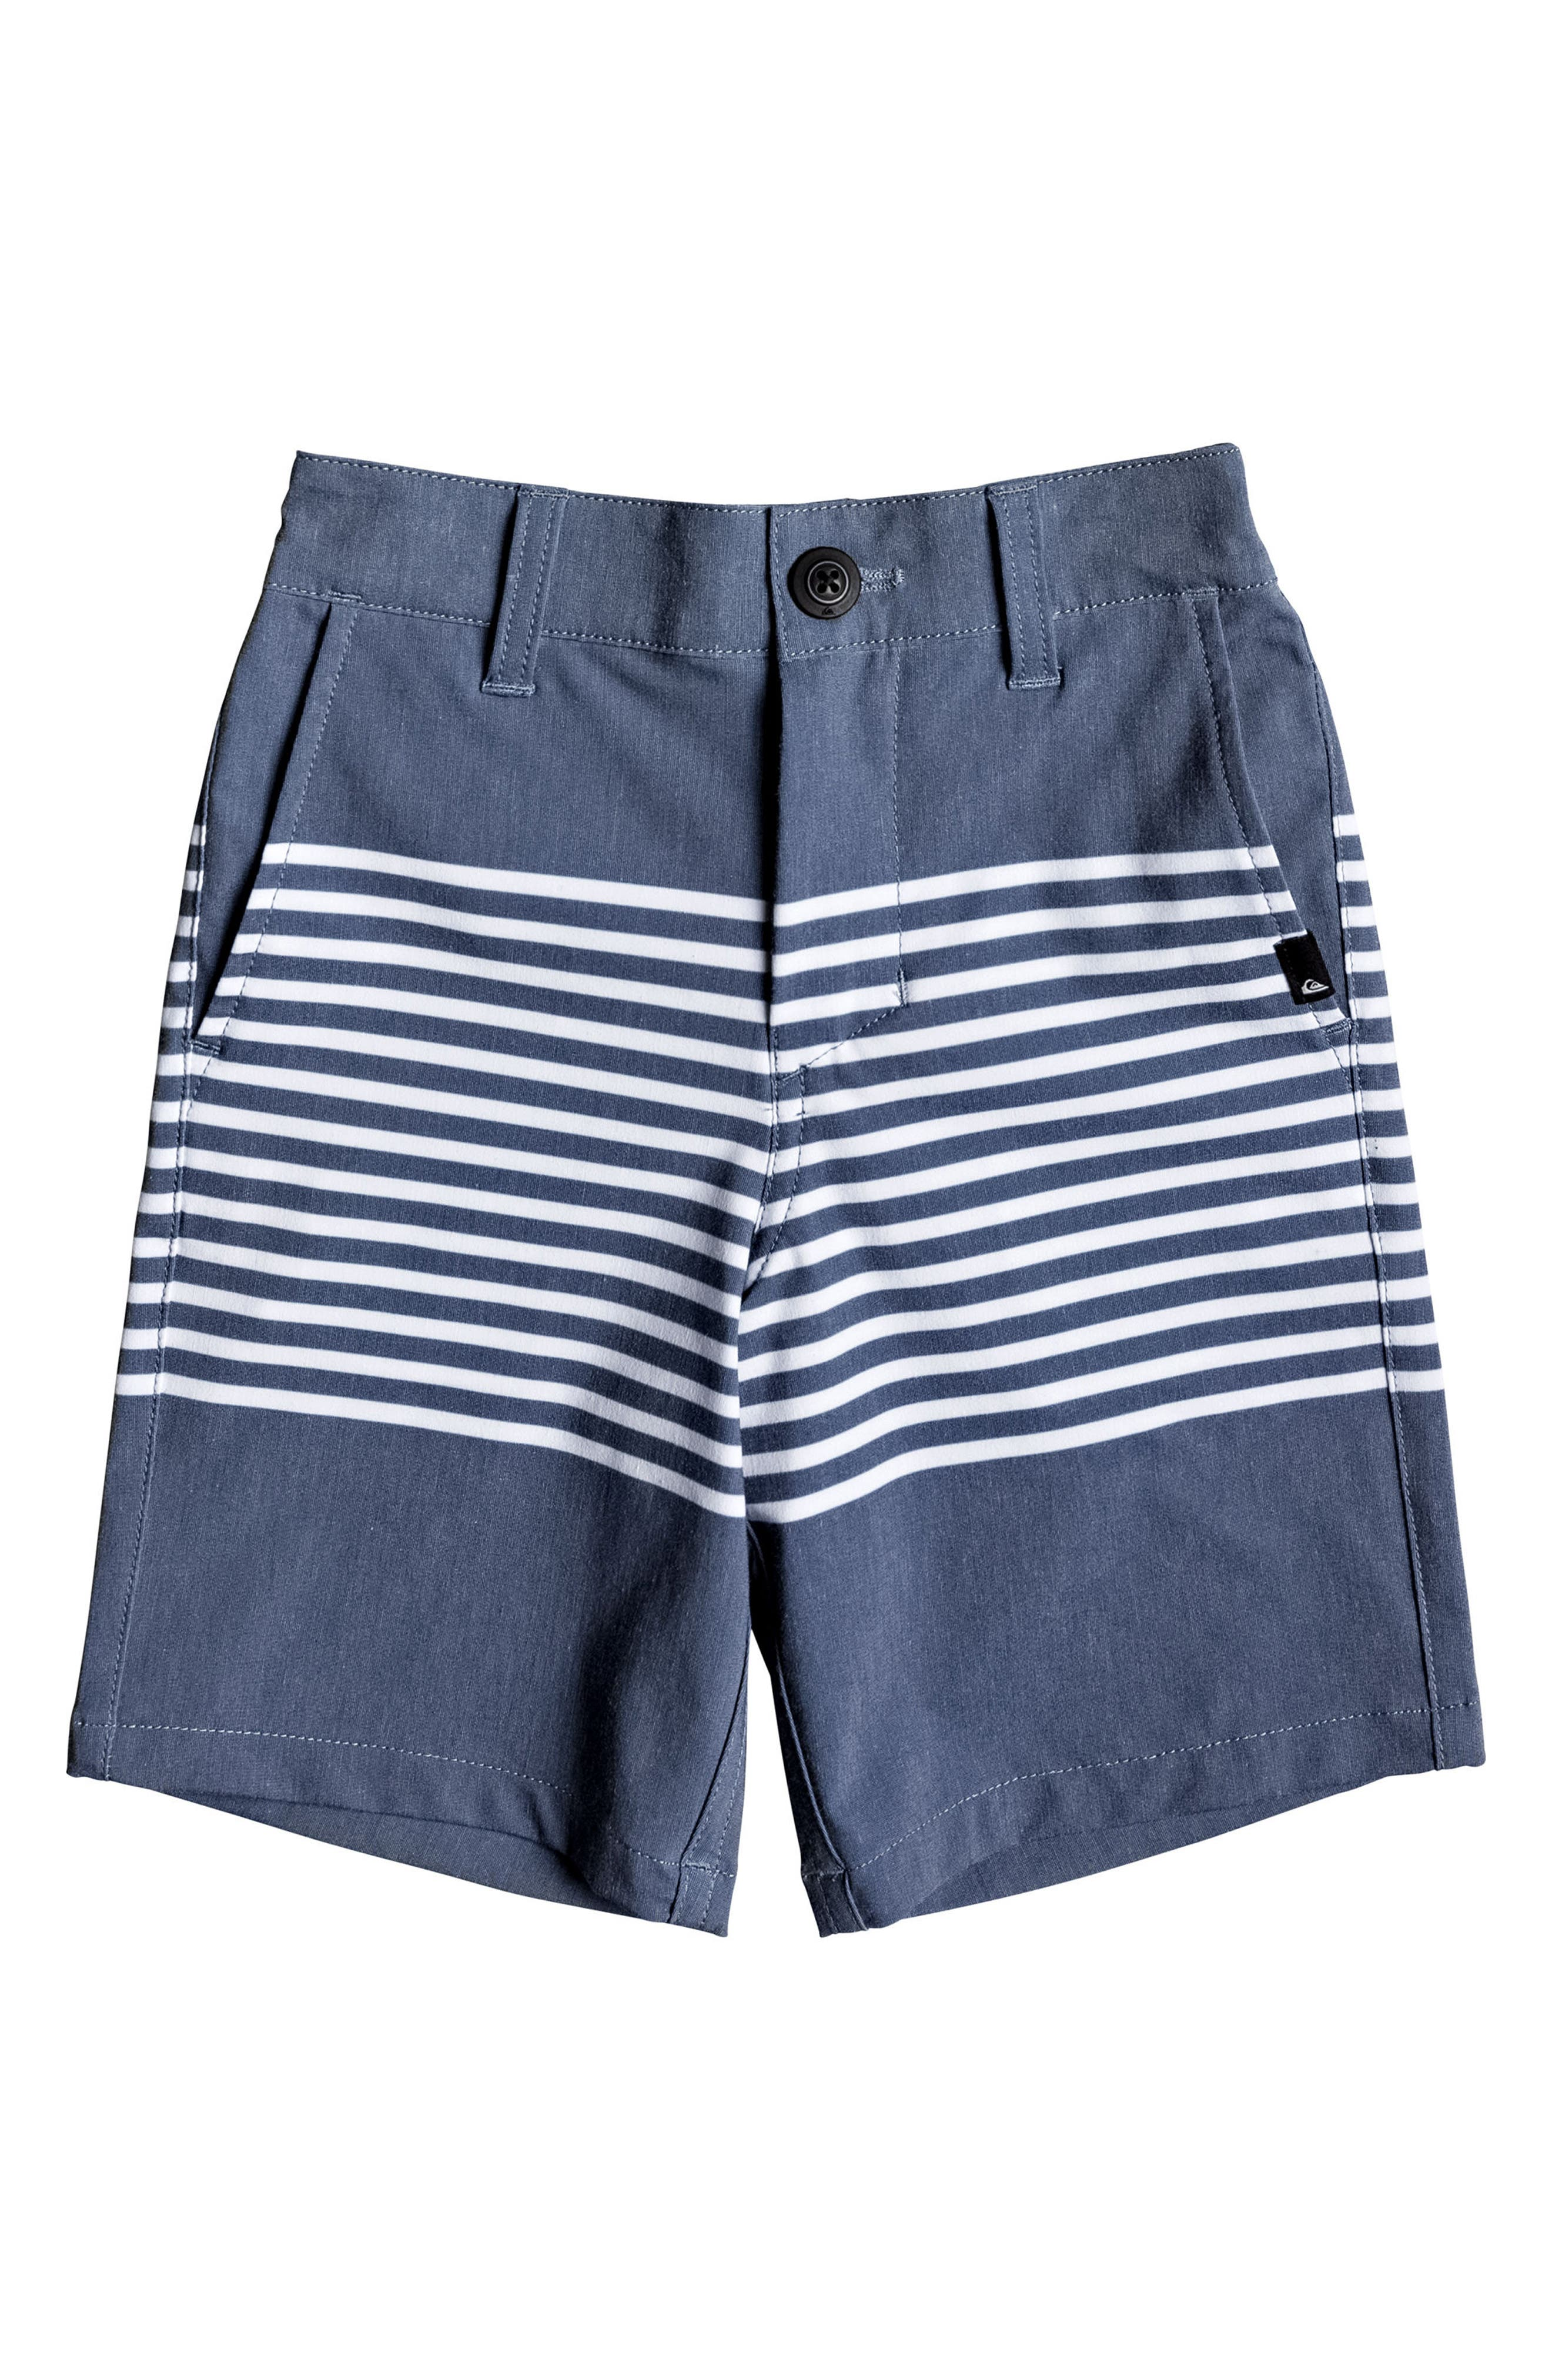 Echo Stripe Amphibian Board Shorts,                         Main,                         color, 401